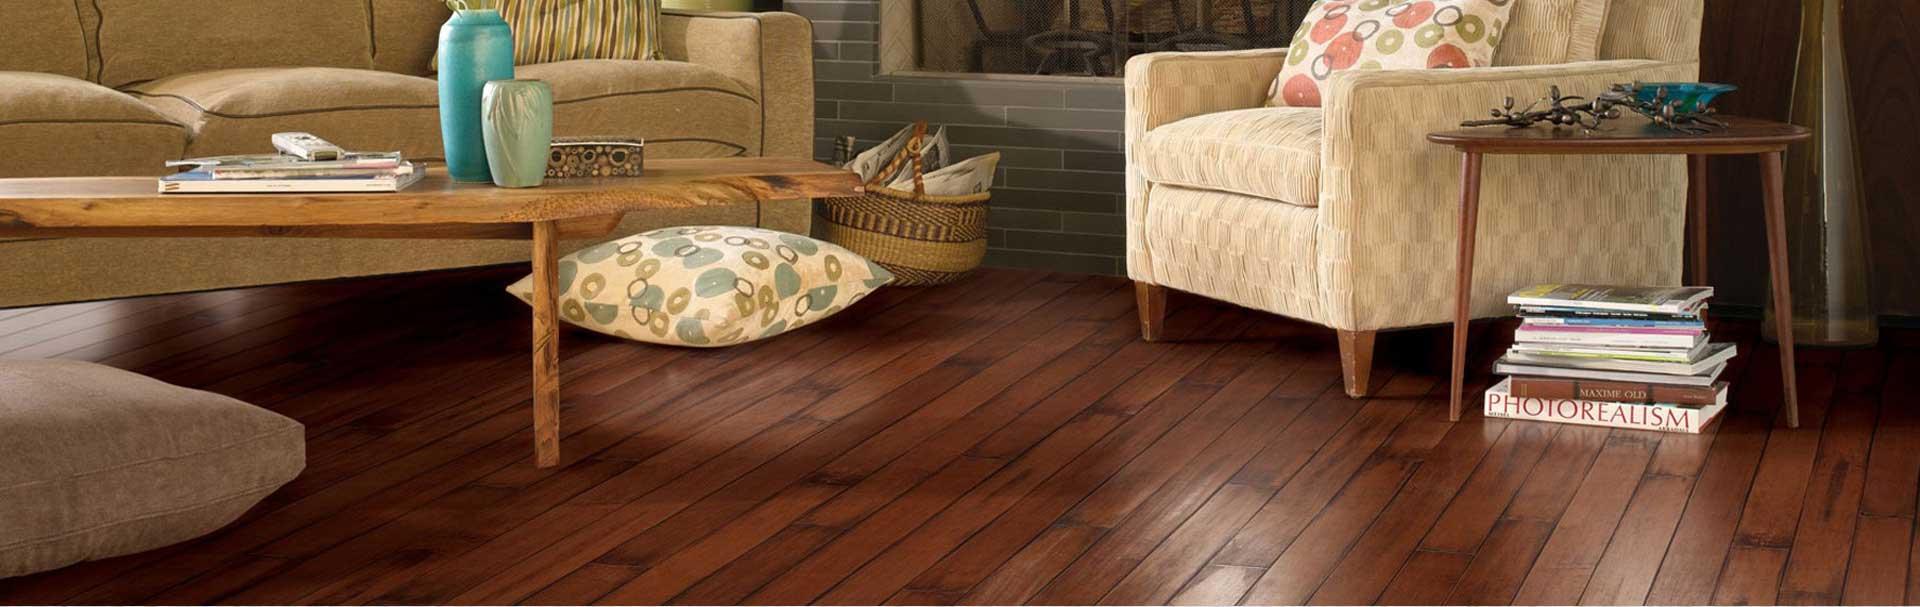 Carpet Cleaning Flooring Store Cabinets Water Fire Restoration Hardwood Tile Luxury Vinyl Floors